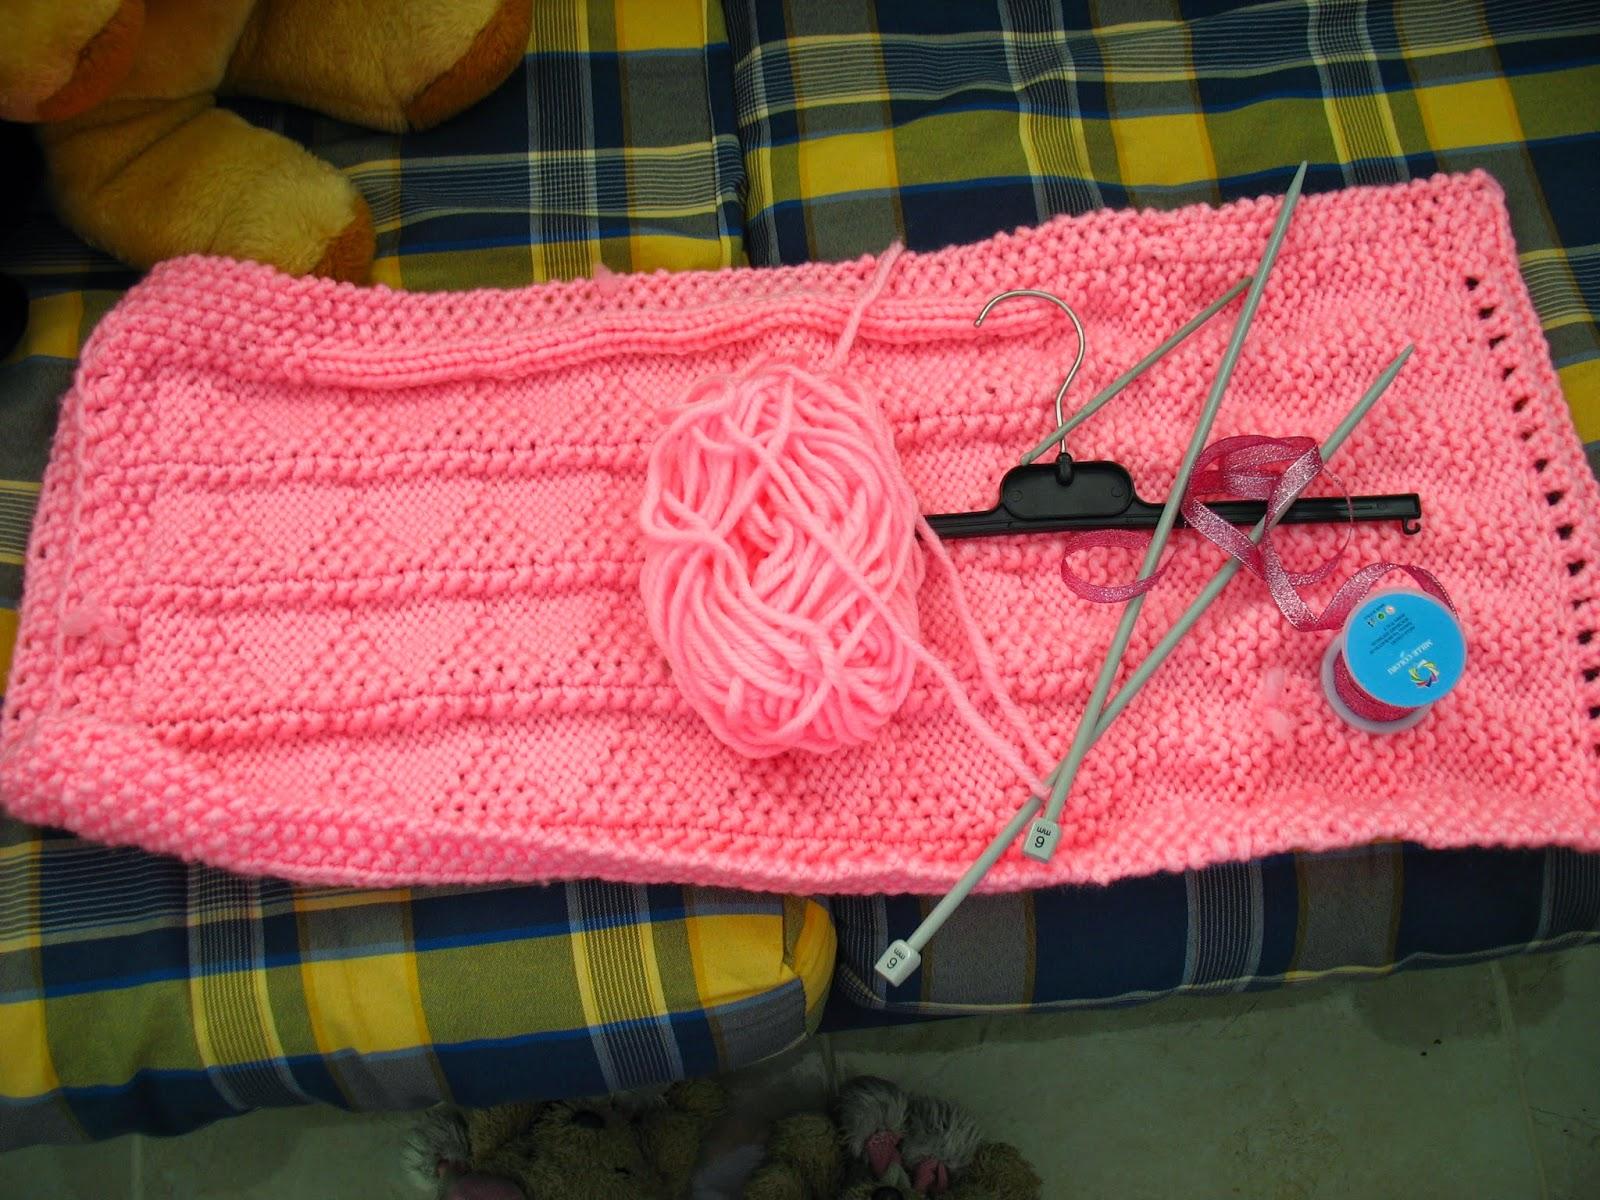 Knitting Pattern For A Peg Bag : Minervas Treasures: DIY - Knitted Peg Bag